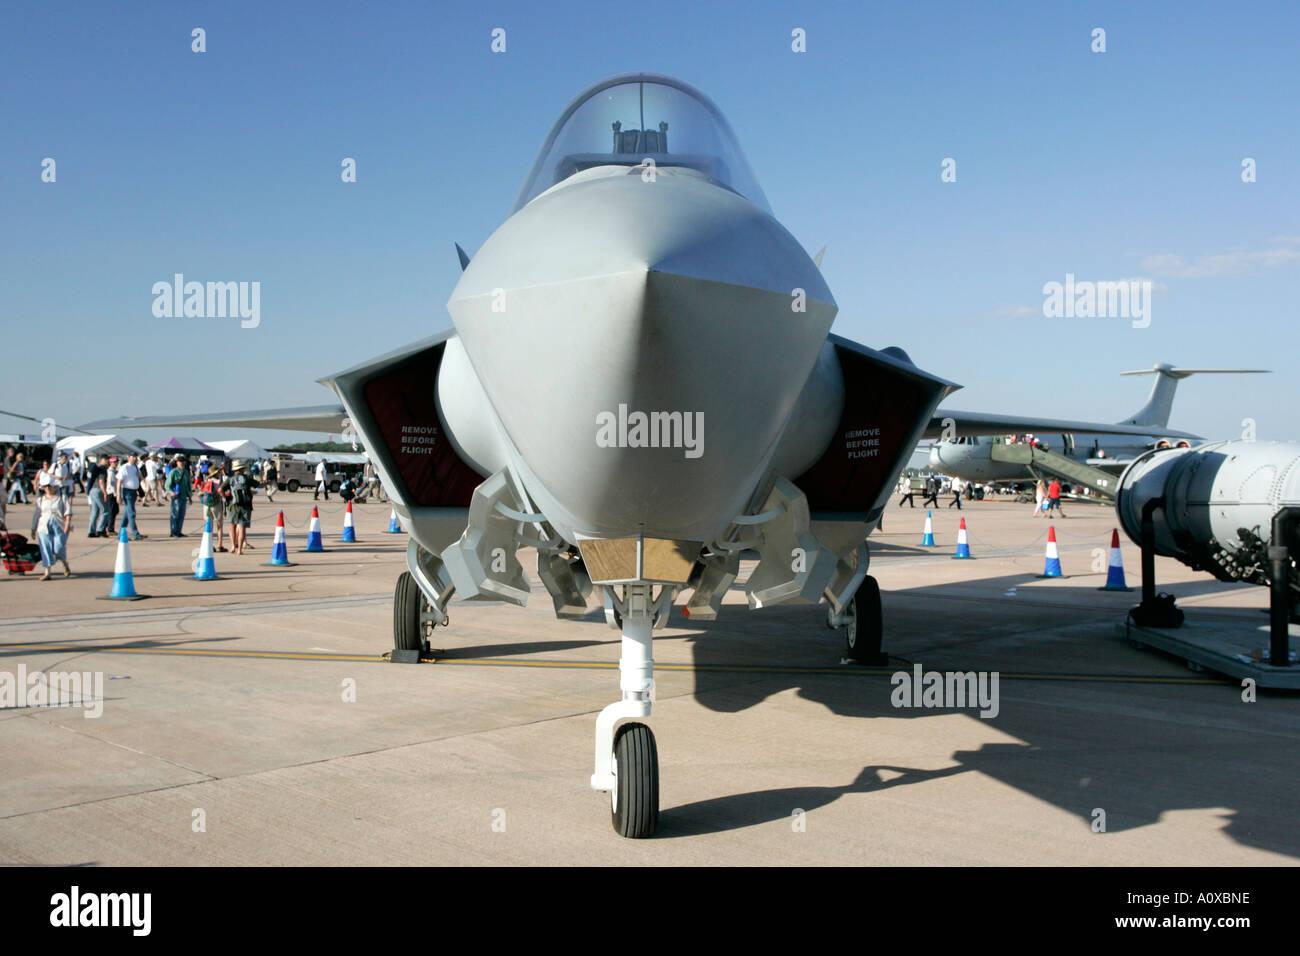 JSF Joint Strike Fighter RAF F35 X 35 Lockheed Martin mock up on static display RAF Fairford Gloucestershire England UK - Stock Image